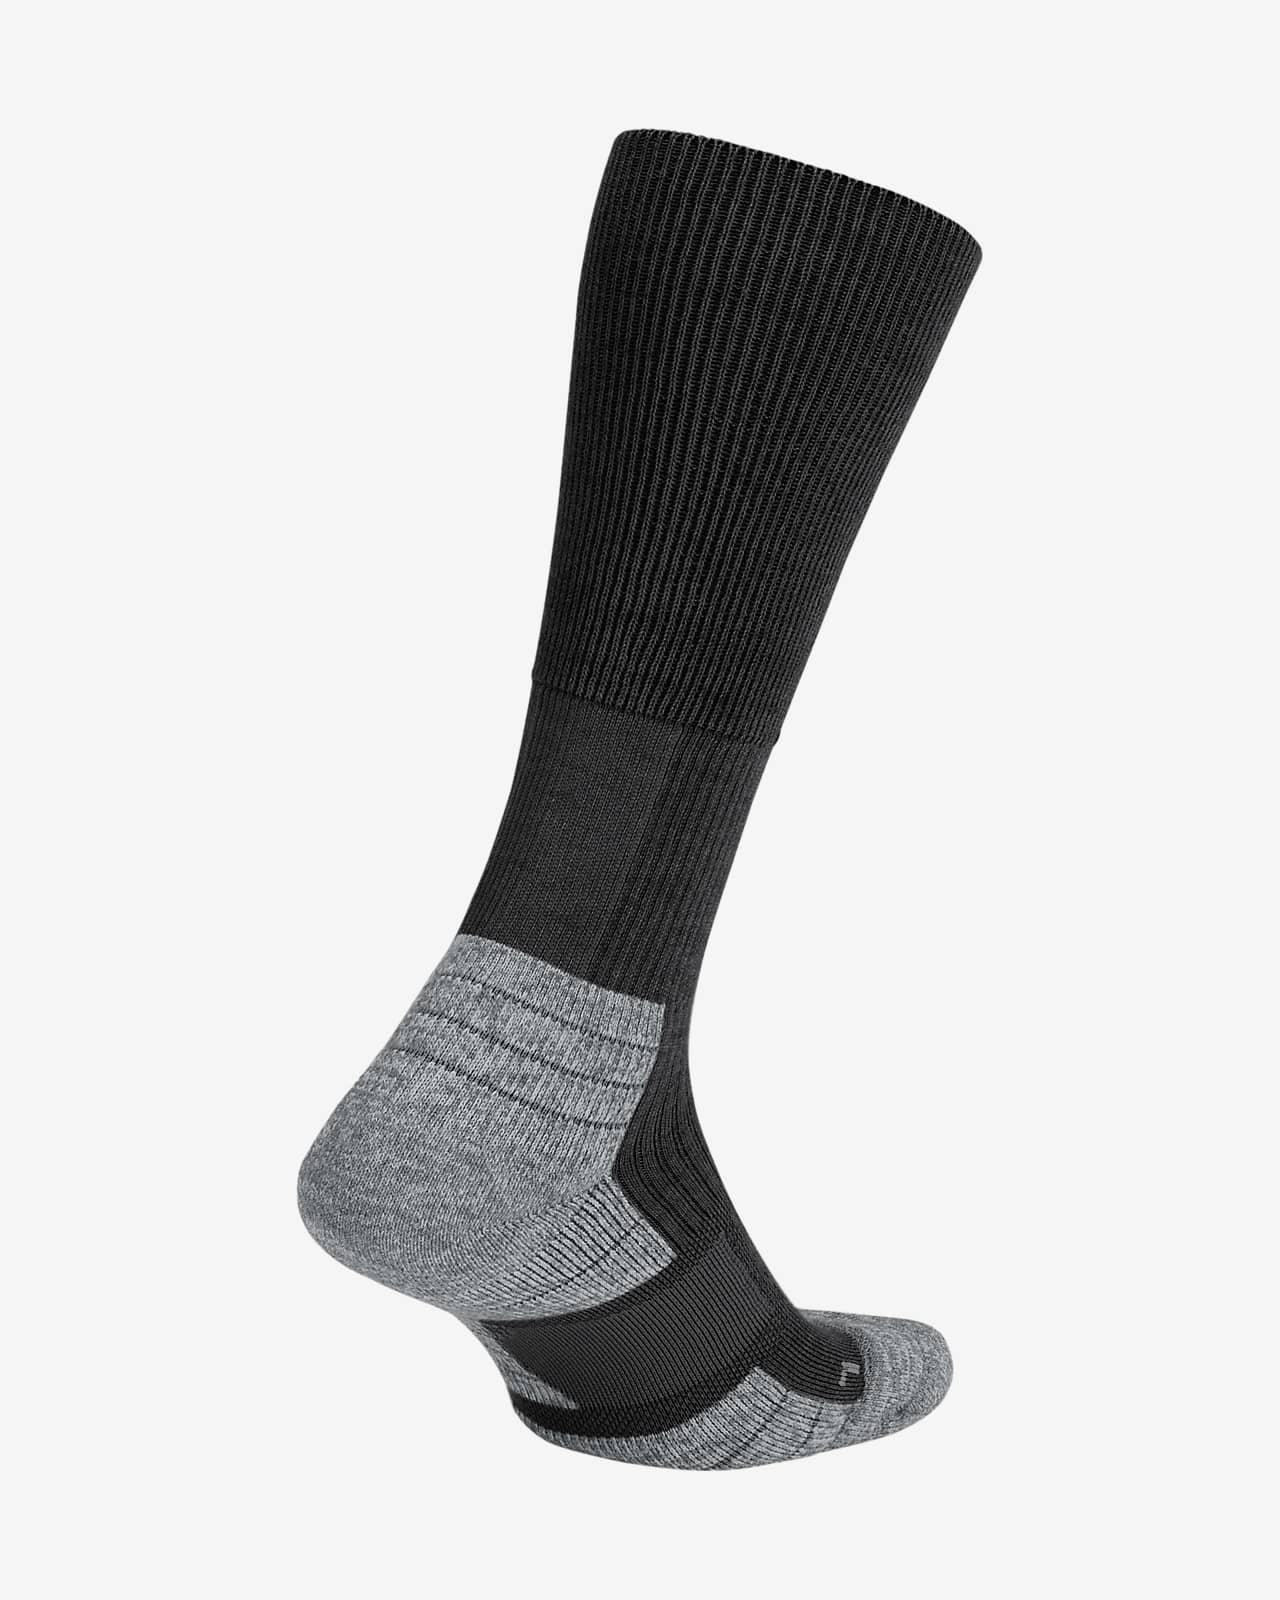 Nike Special Field Training Crew Socks